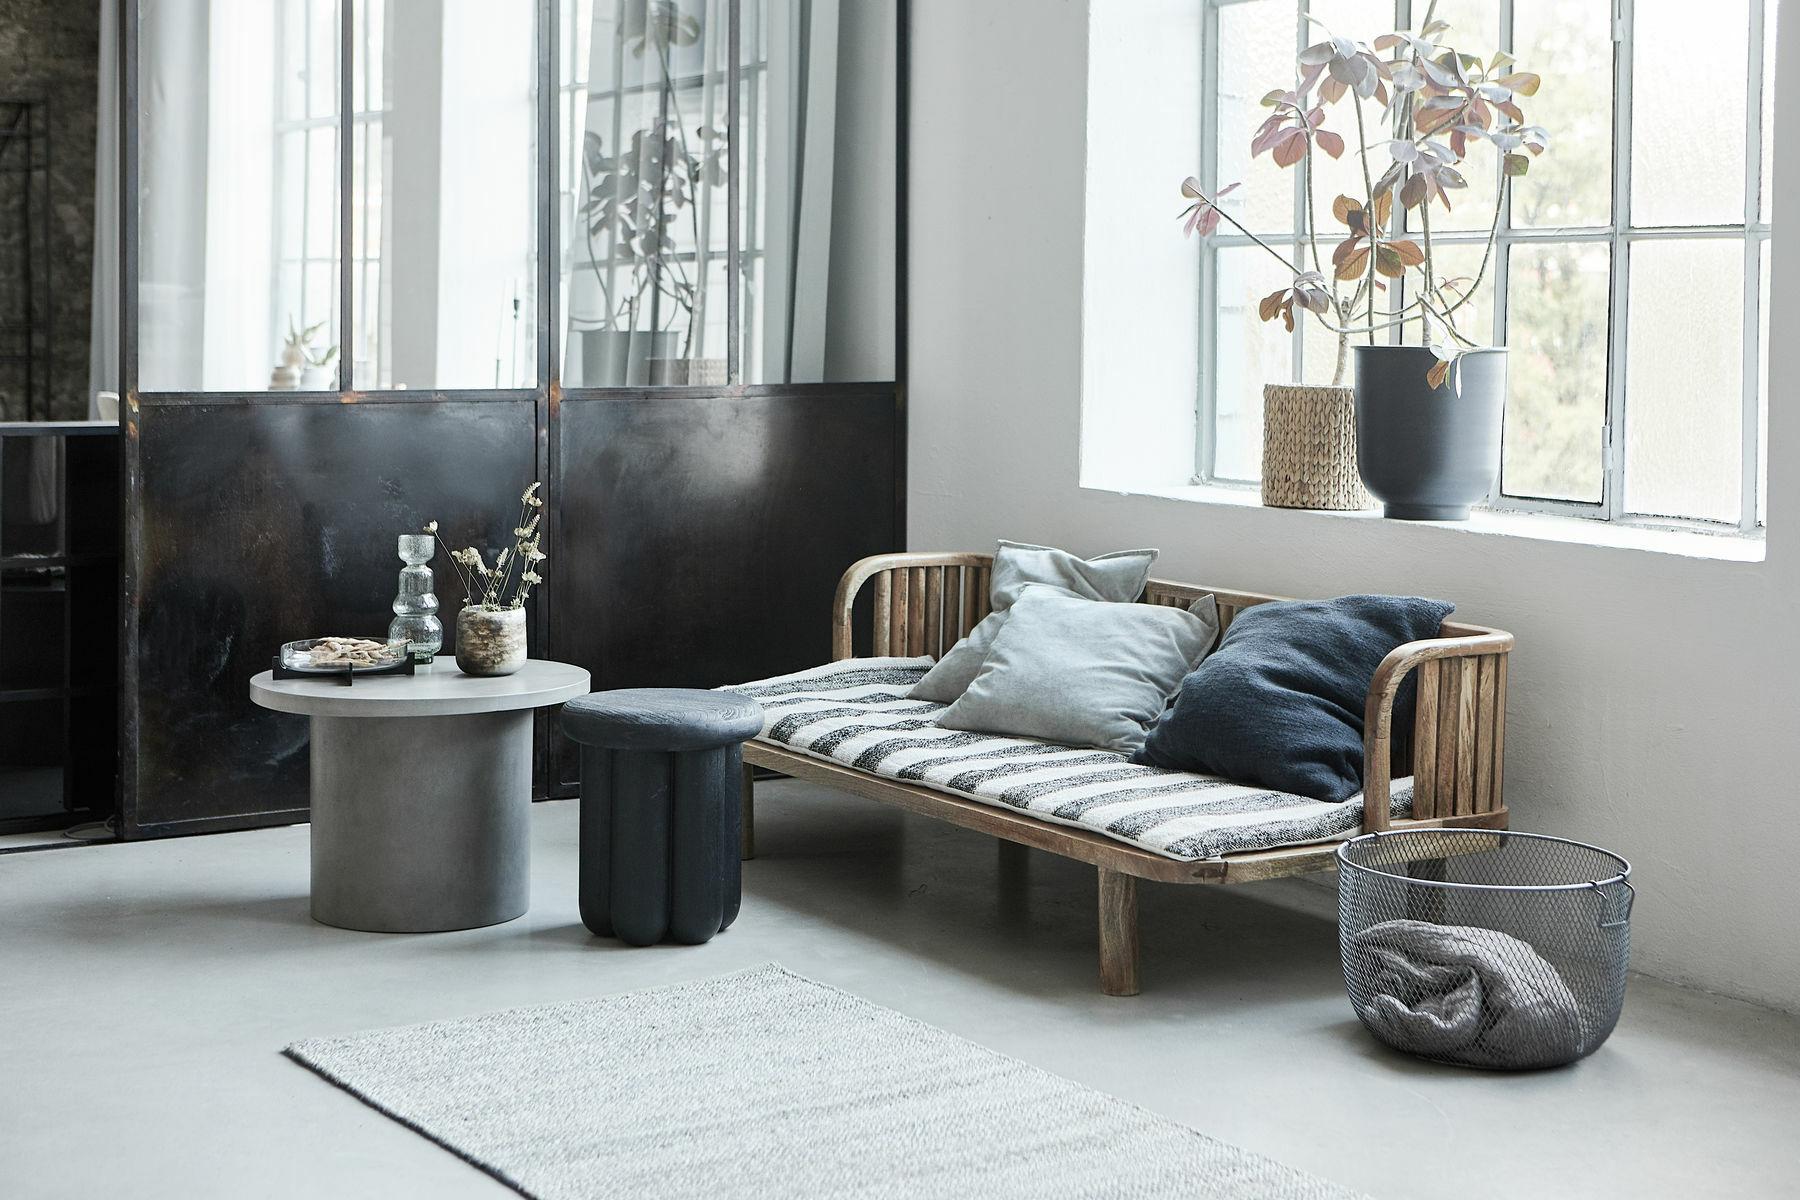 minimalista belső tér